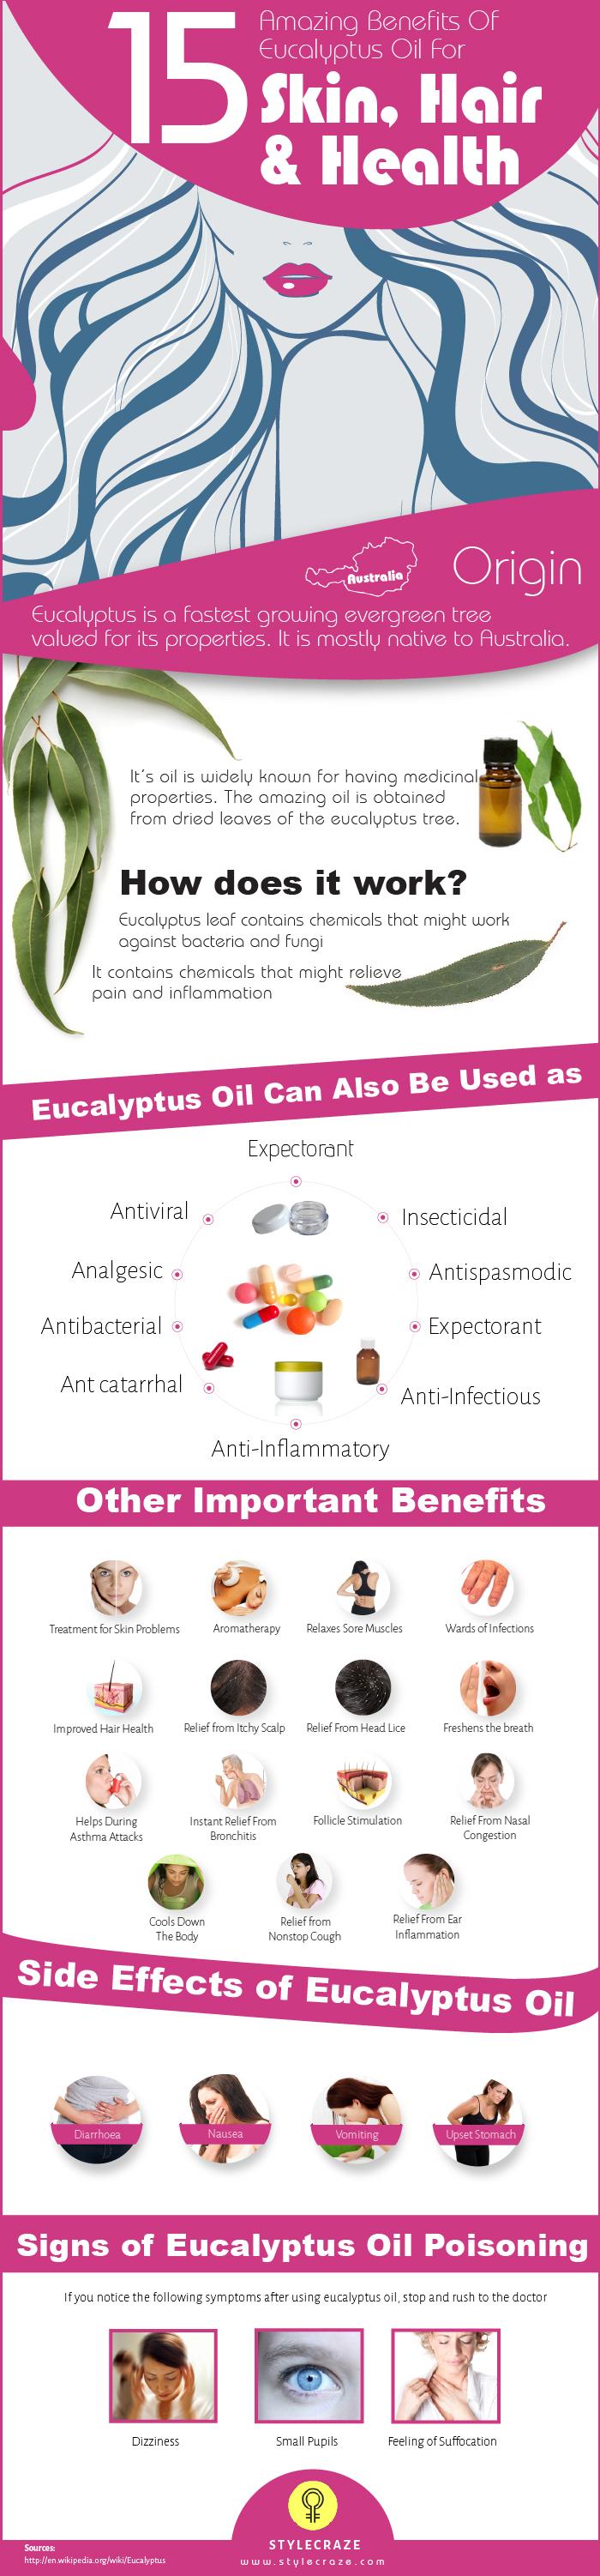 6 Health Benefits Of Eucalyptus Oil + Uses